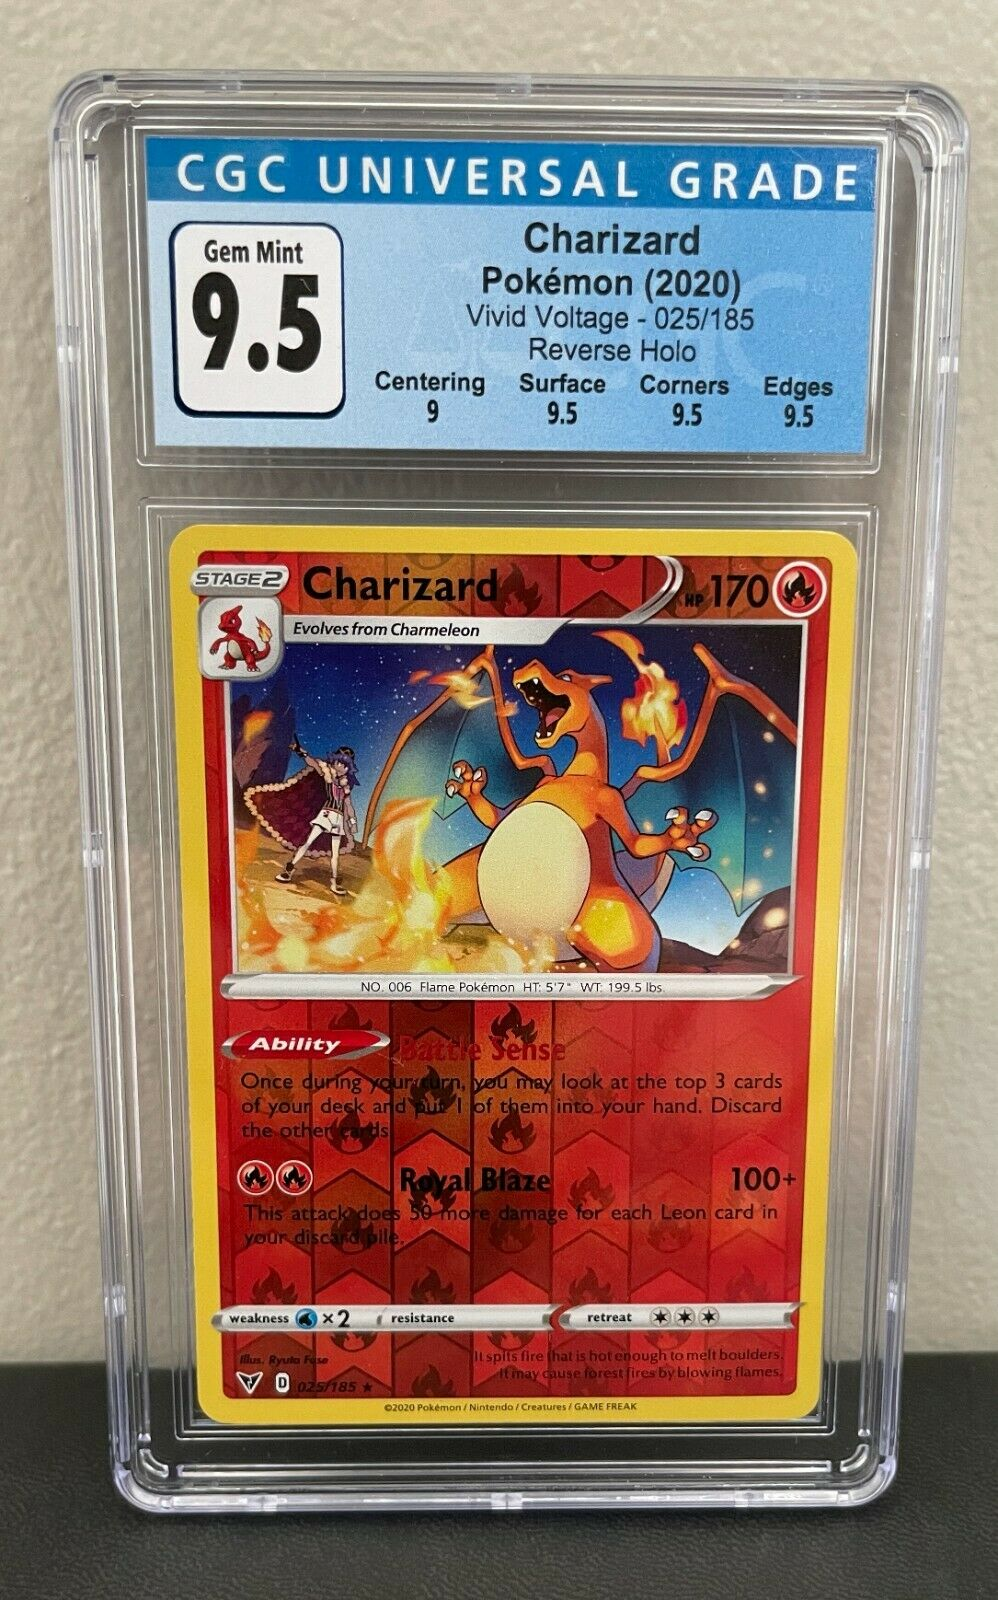 Details about  /Pokemon Vivid Voltage Charizard 025//185 NM//M Non-Holo